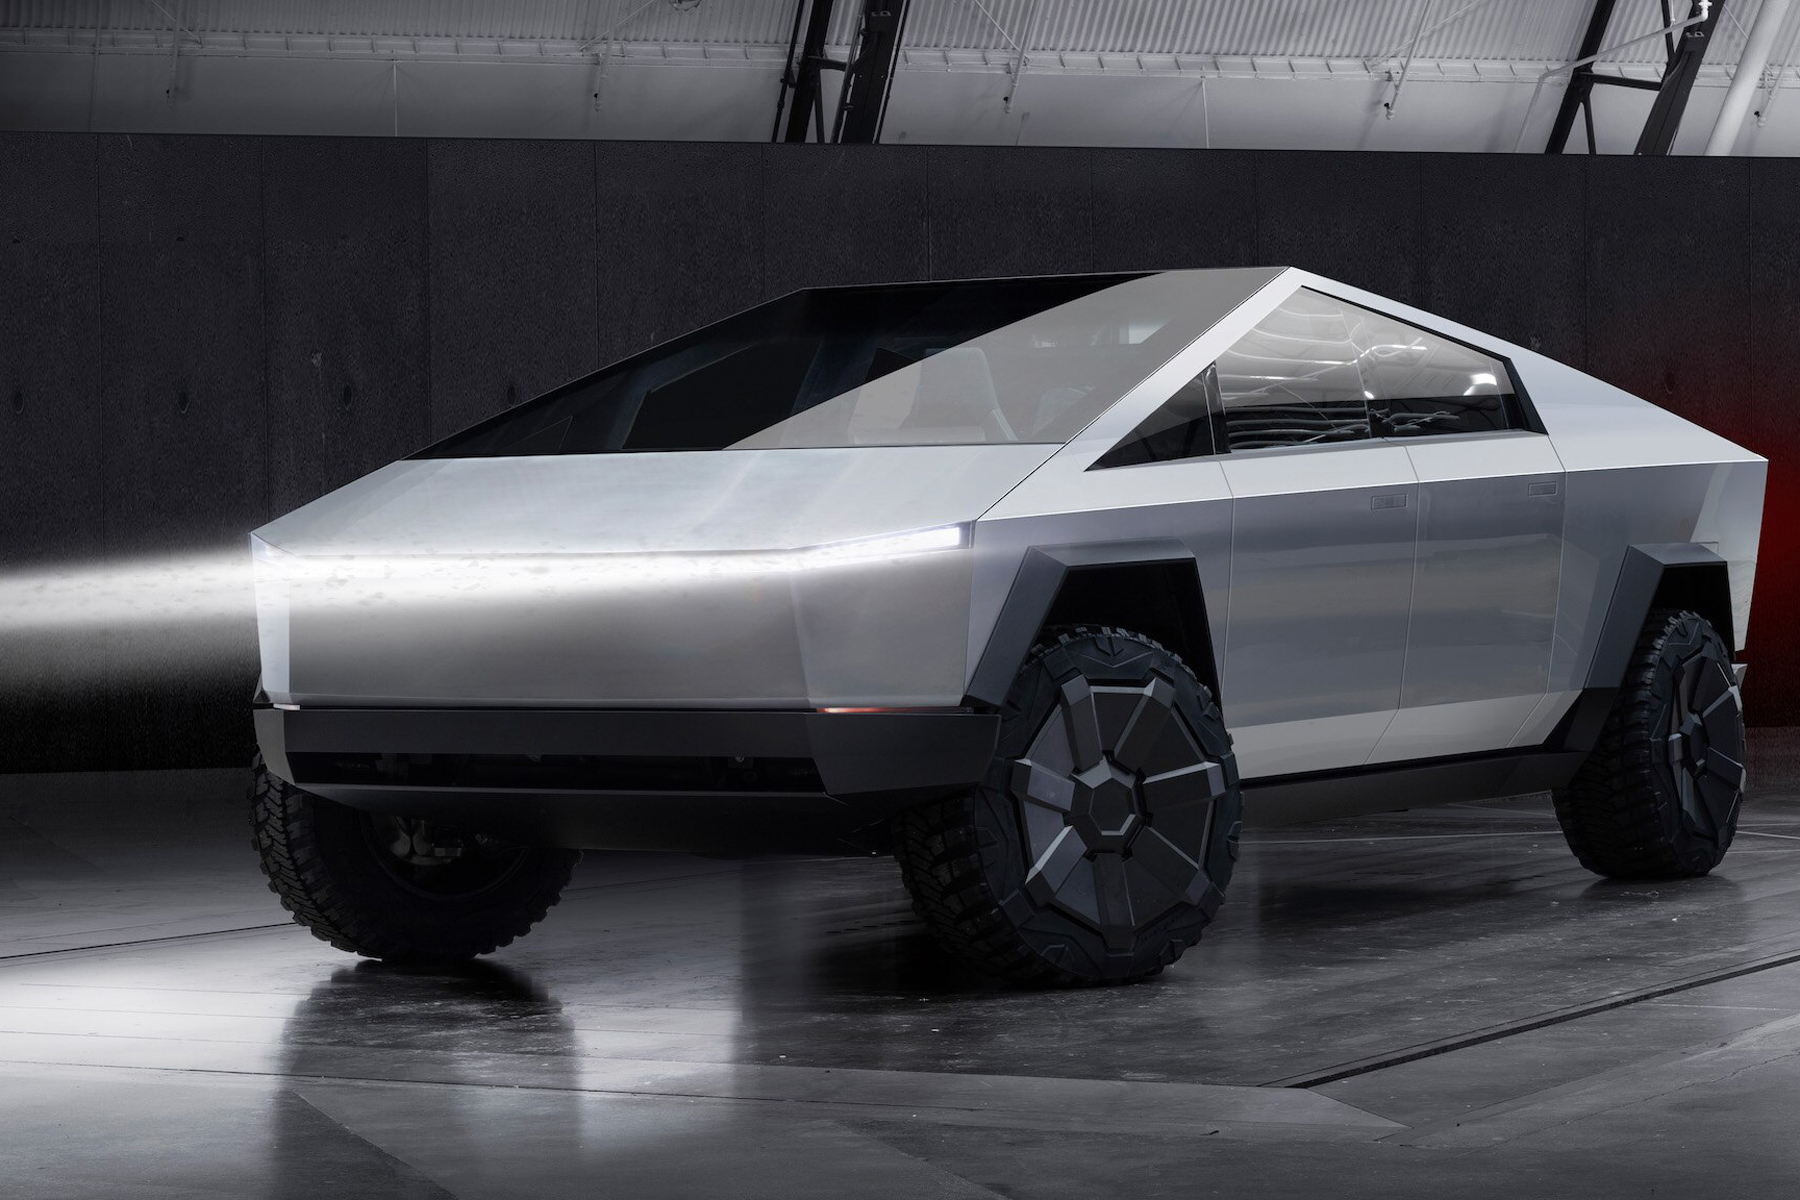 Tesla's Cybertruck: Not the 'Smash' Hit Elon Musk Was Expecting